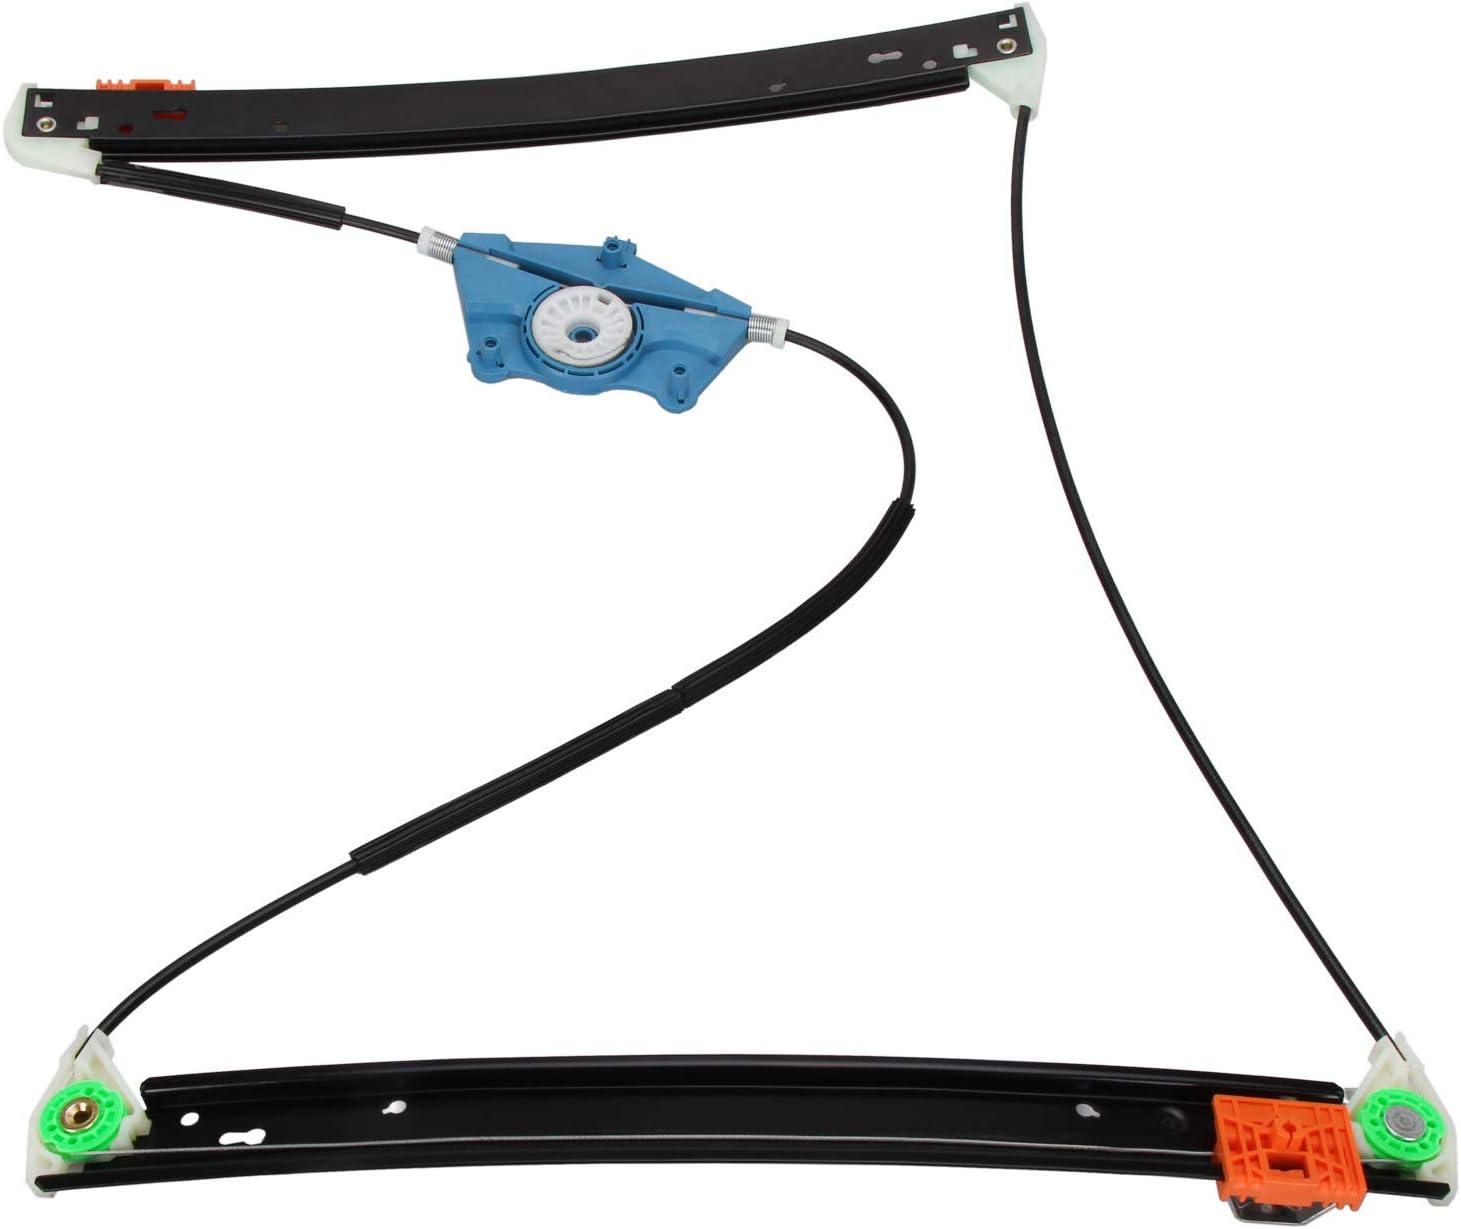 Dromedary 8e0837462b Fensterheber Elektrisch Ohne Motor Vorne Rechts 4 5 Türer A4 8e2 B6 8ec B7 Auto